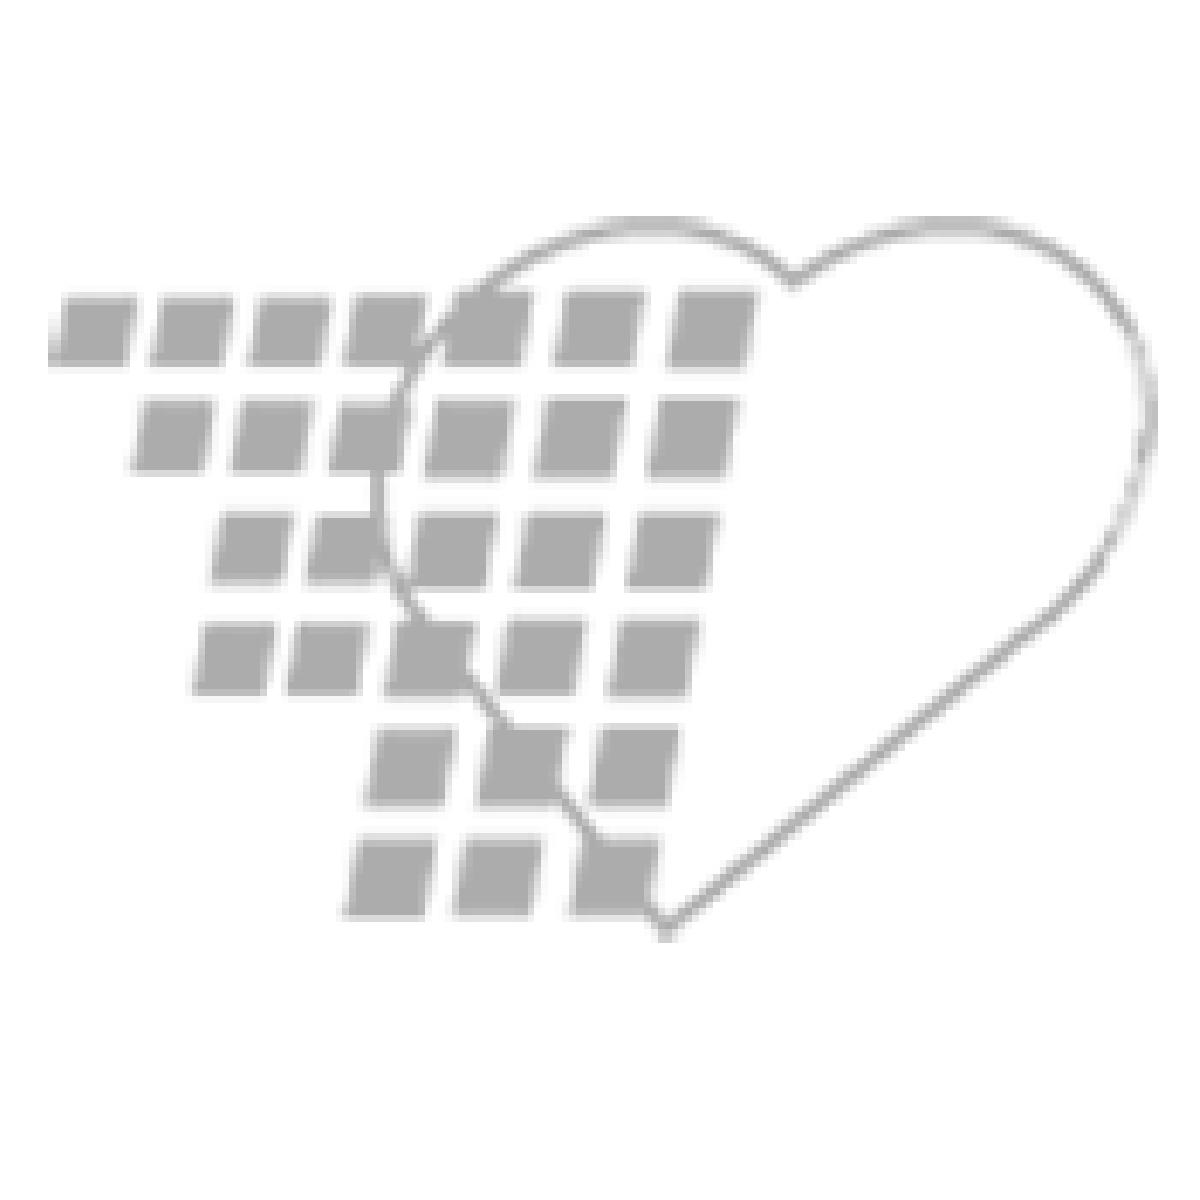 08-04-33 - BD   E-Z Scrub   Sterile Dry Surgical Scrub Brush - Green